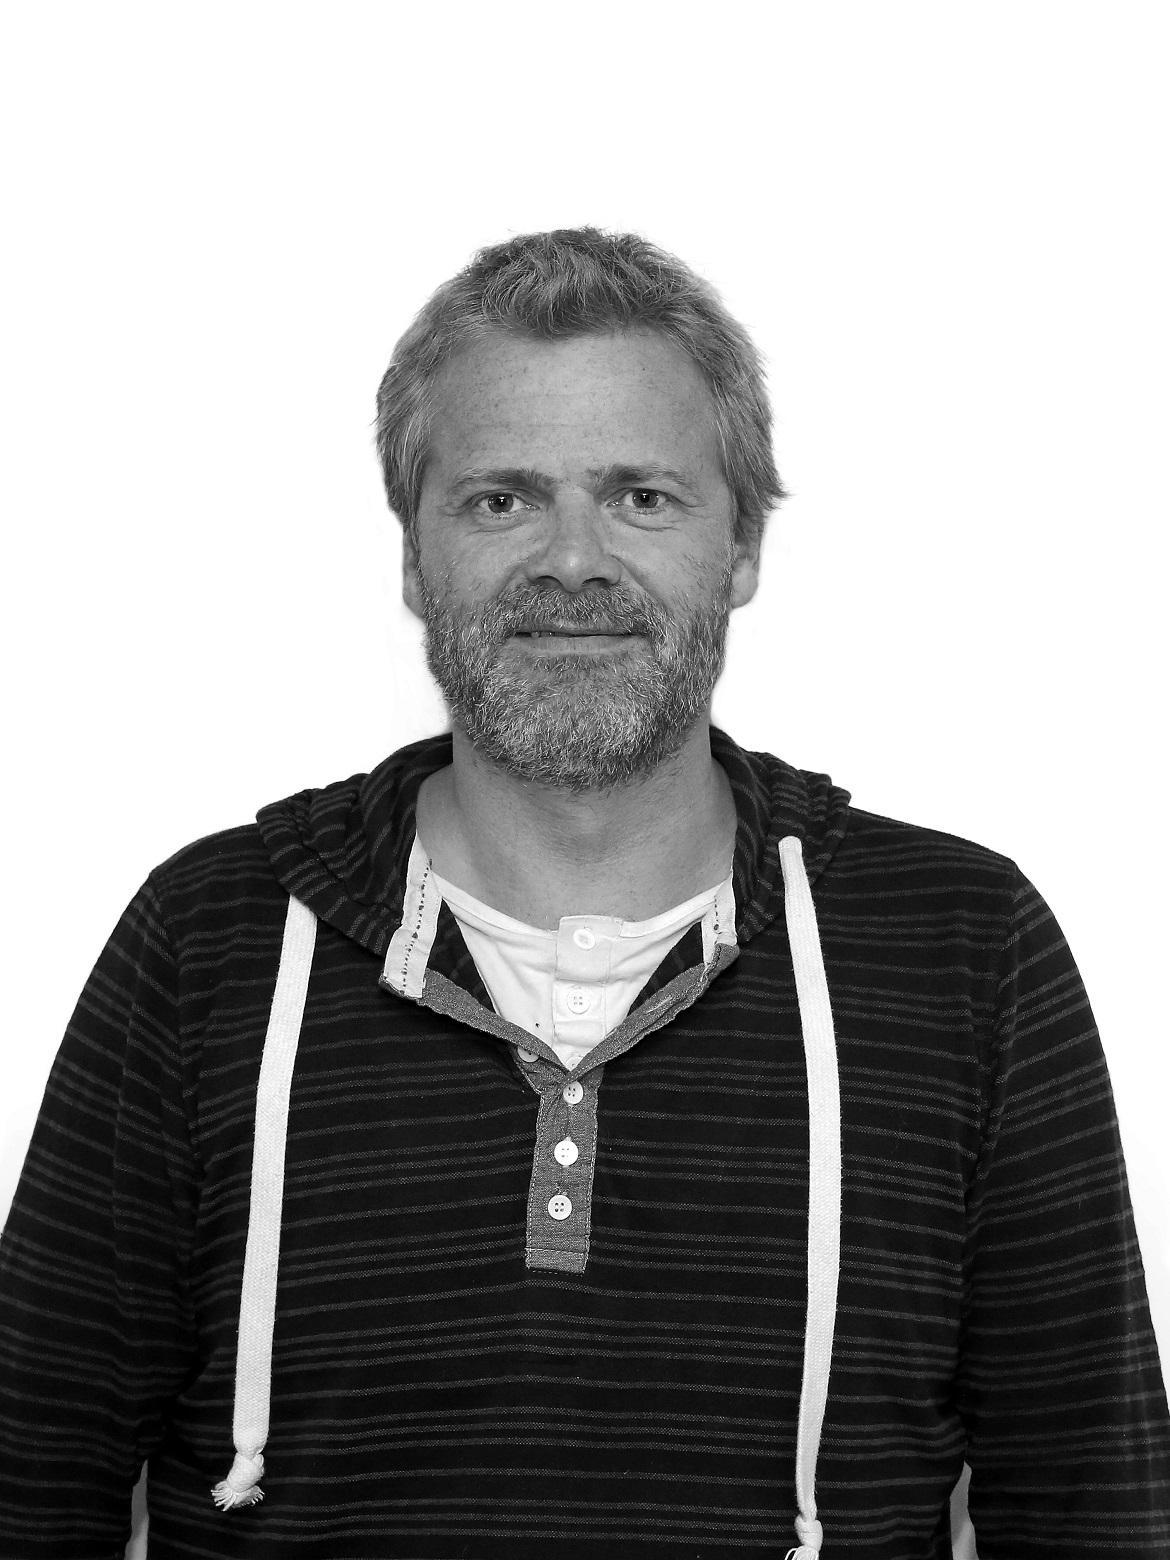 Daniel Knobloch